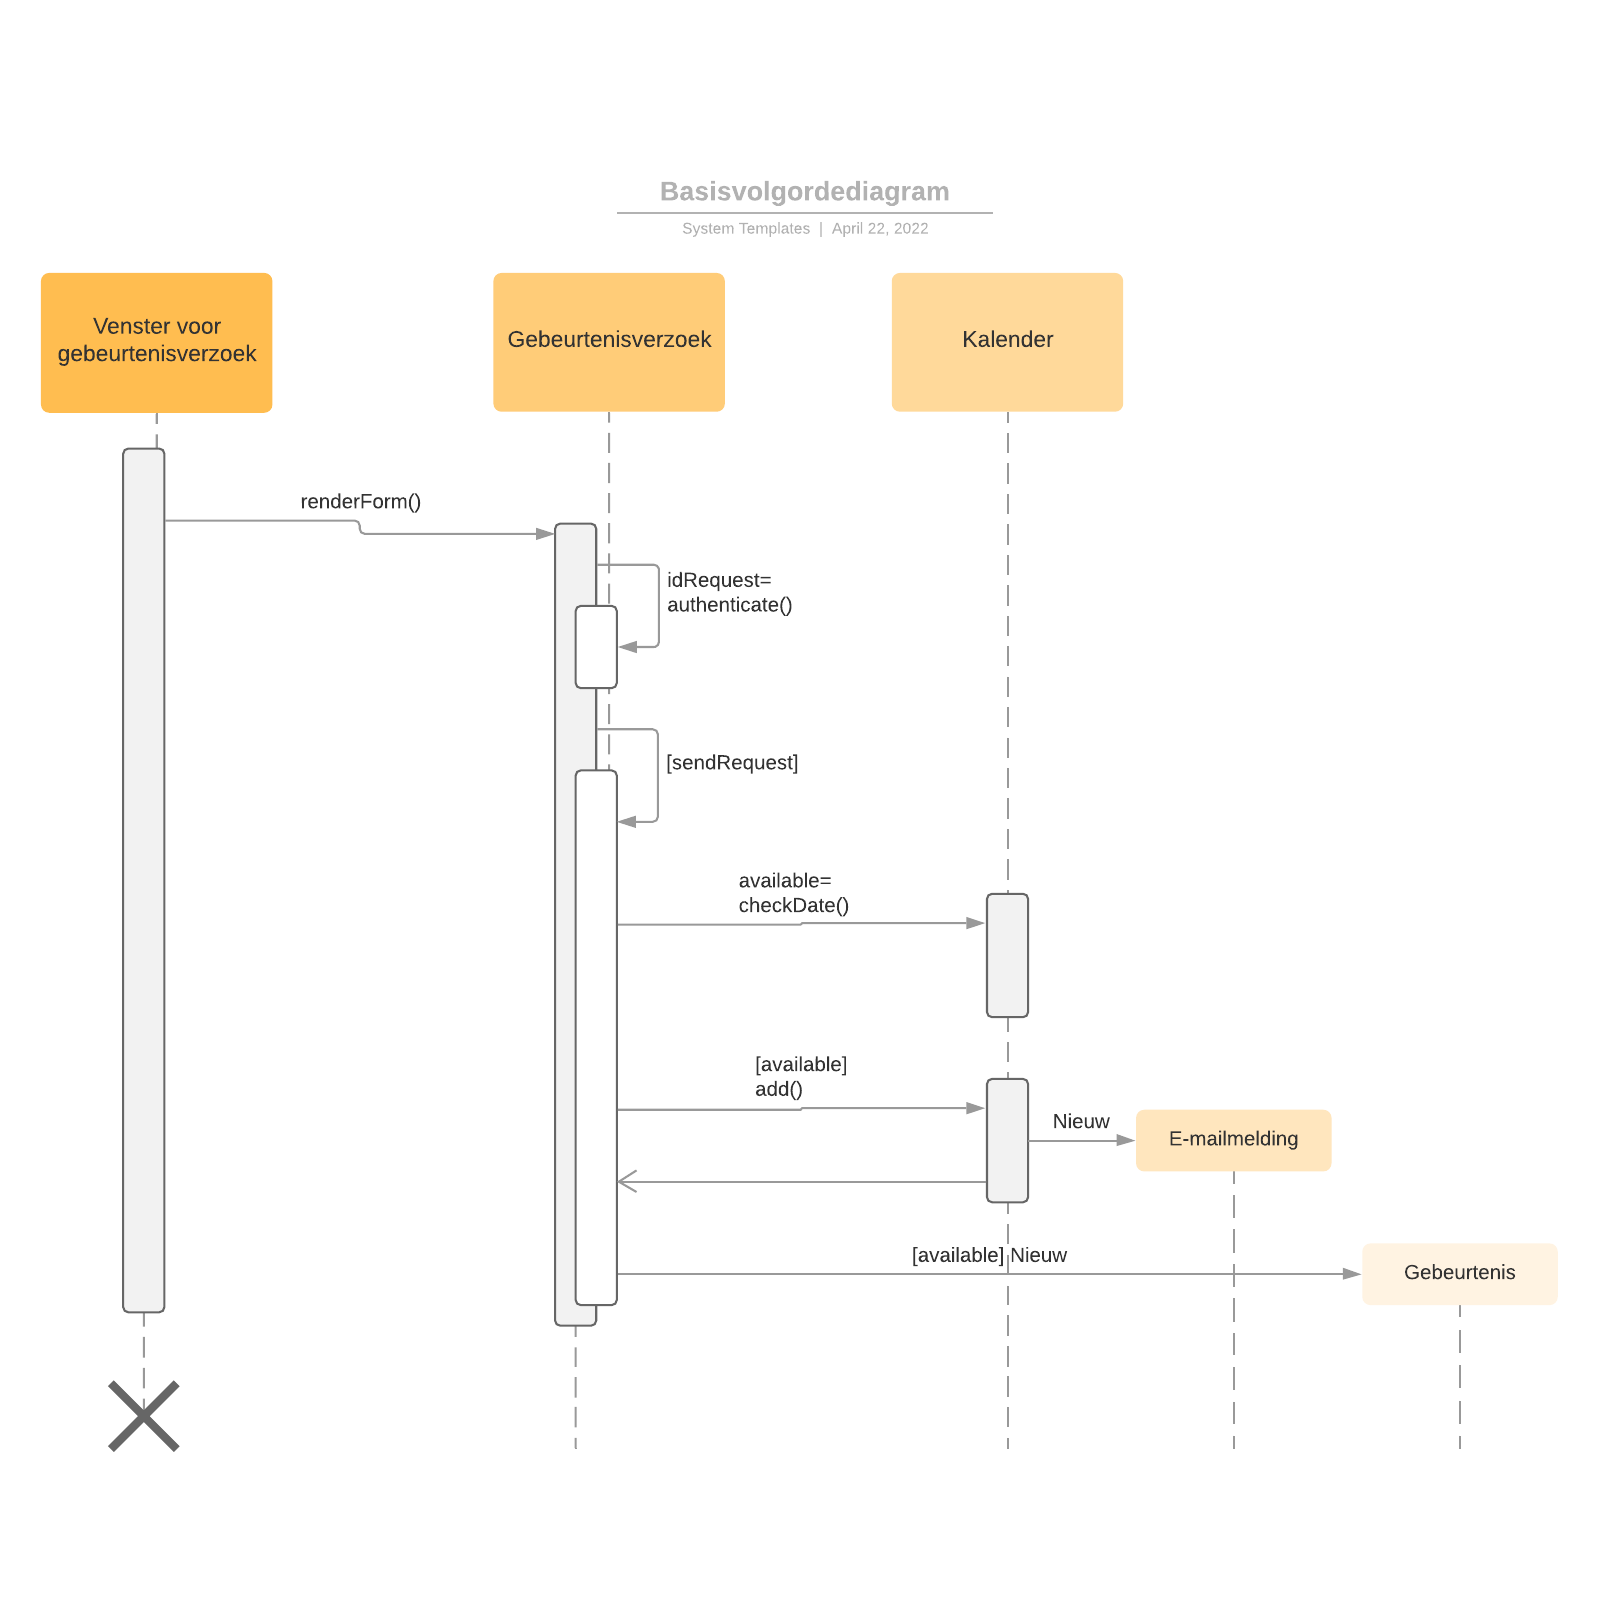 Basisvolgordediagram